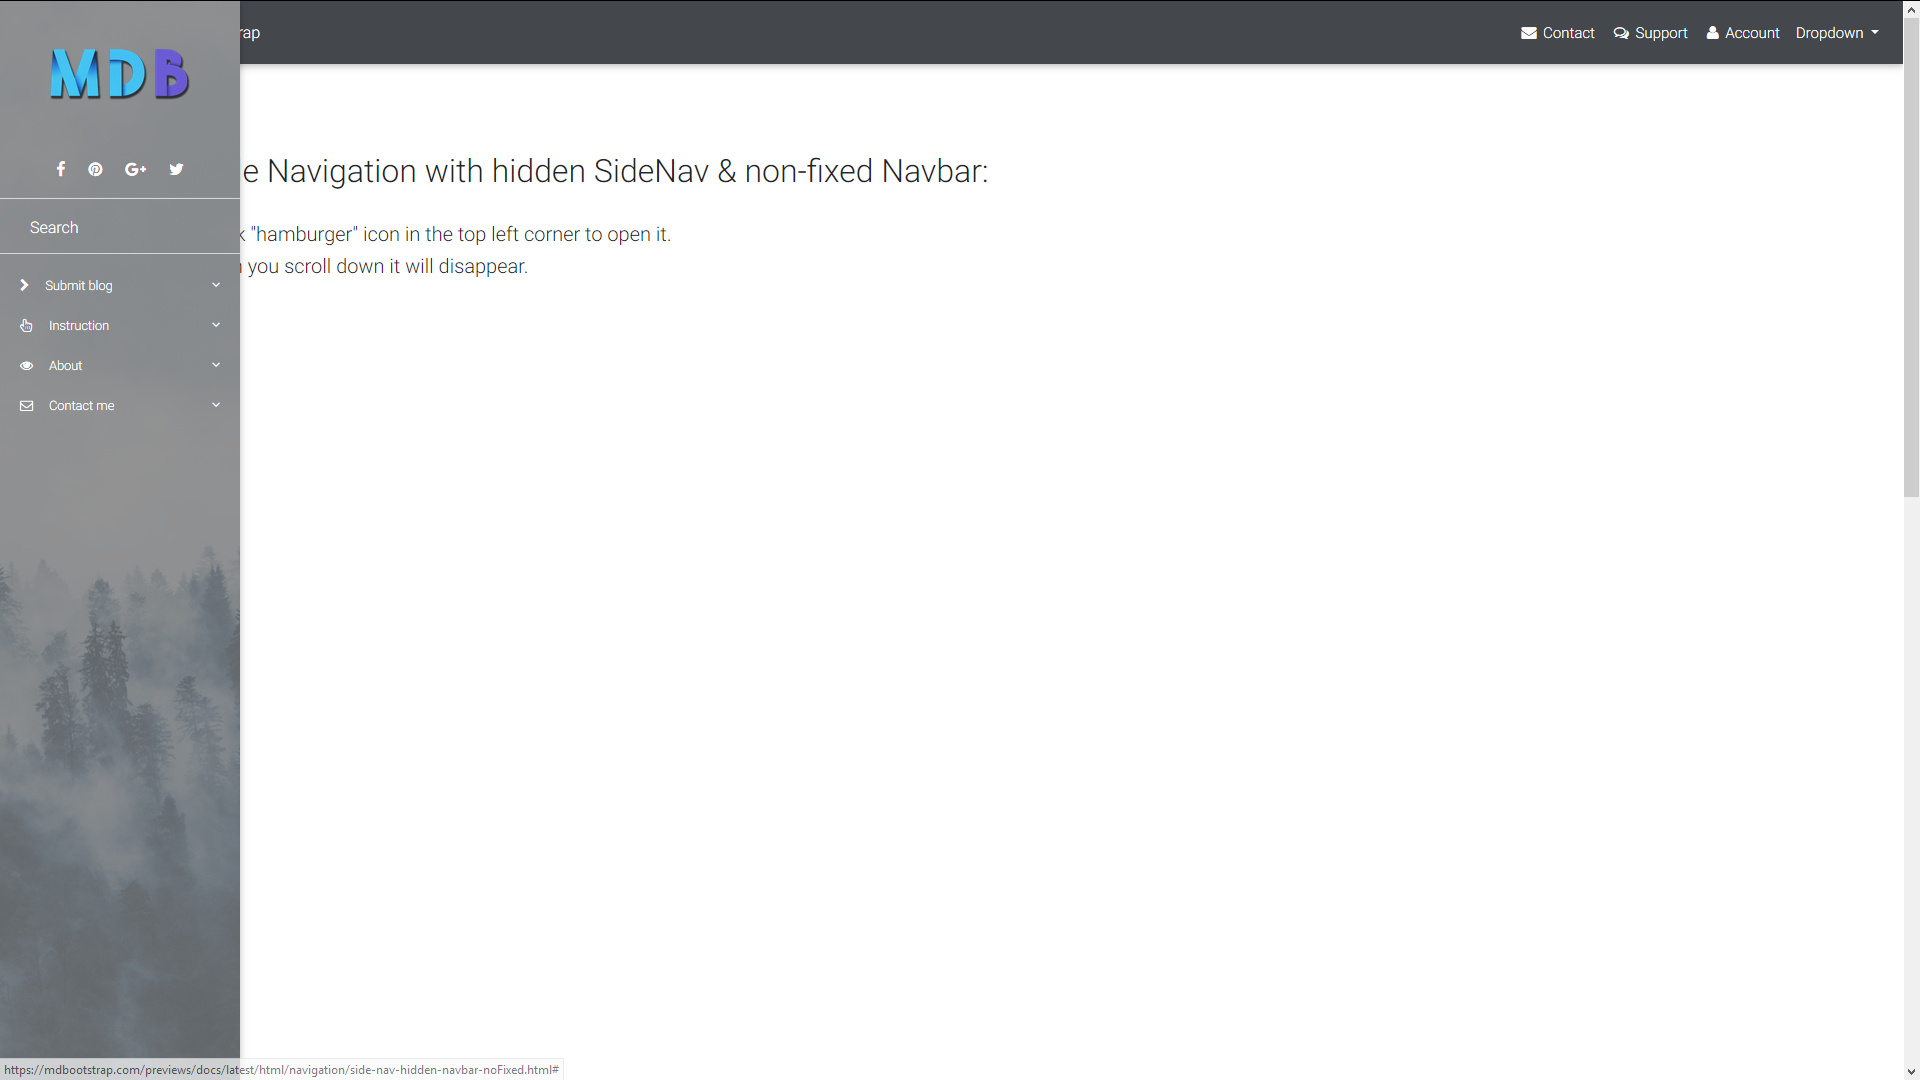 Double Navigation with hidden SideNav & (non) fixed Navbar